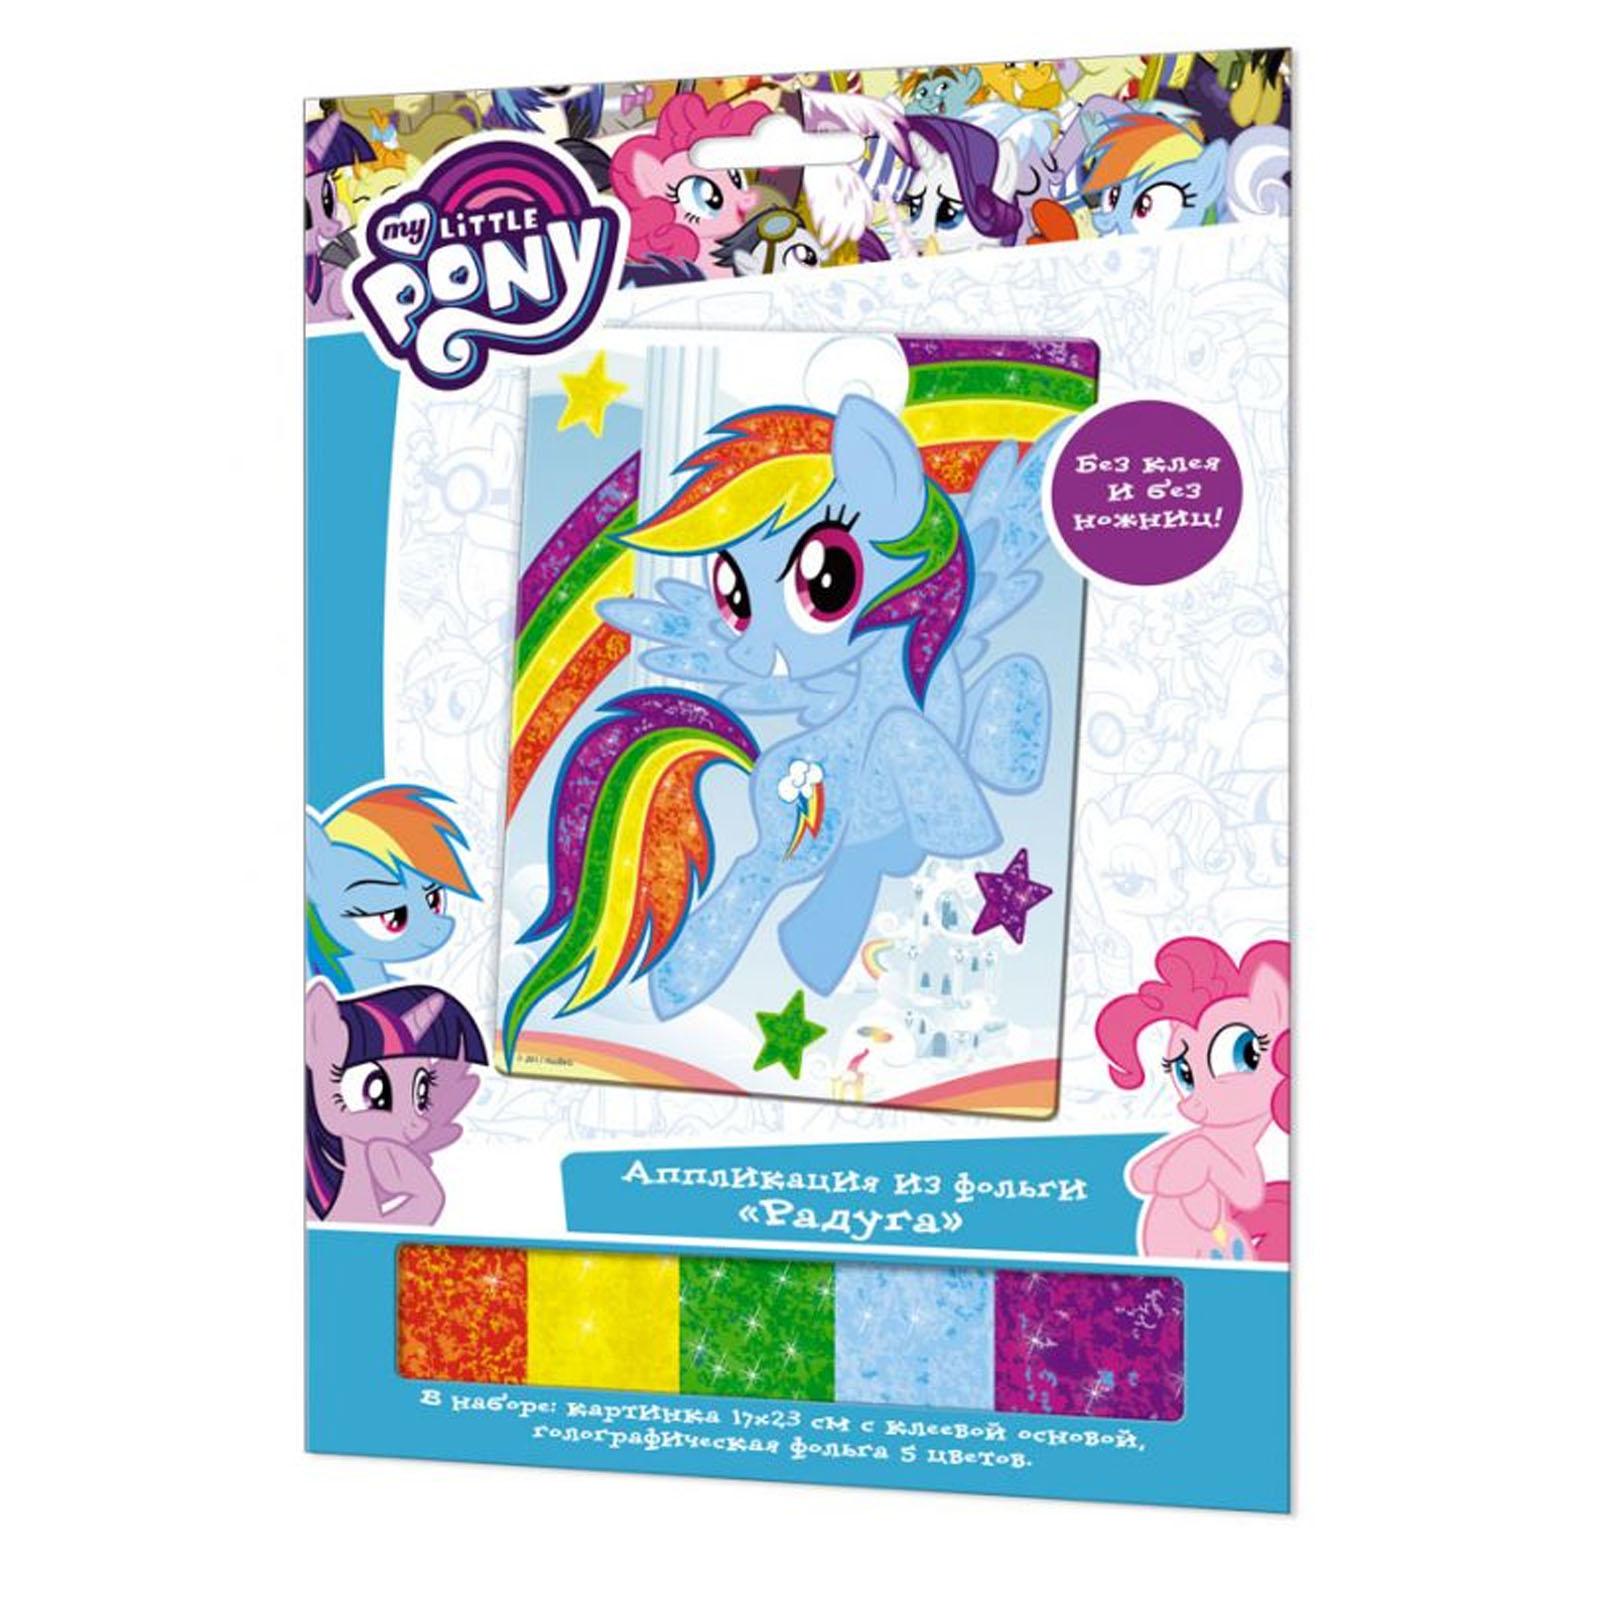 Аппликация из фольги My little pony – РадугаАппликация, пайетки<br>Аппликация из фольги My little pony – Радуга<br>